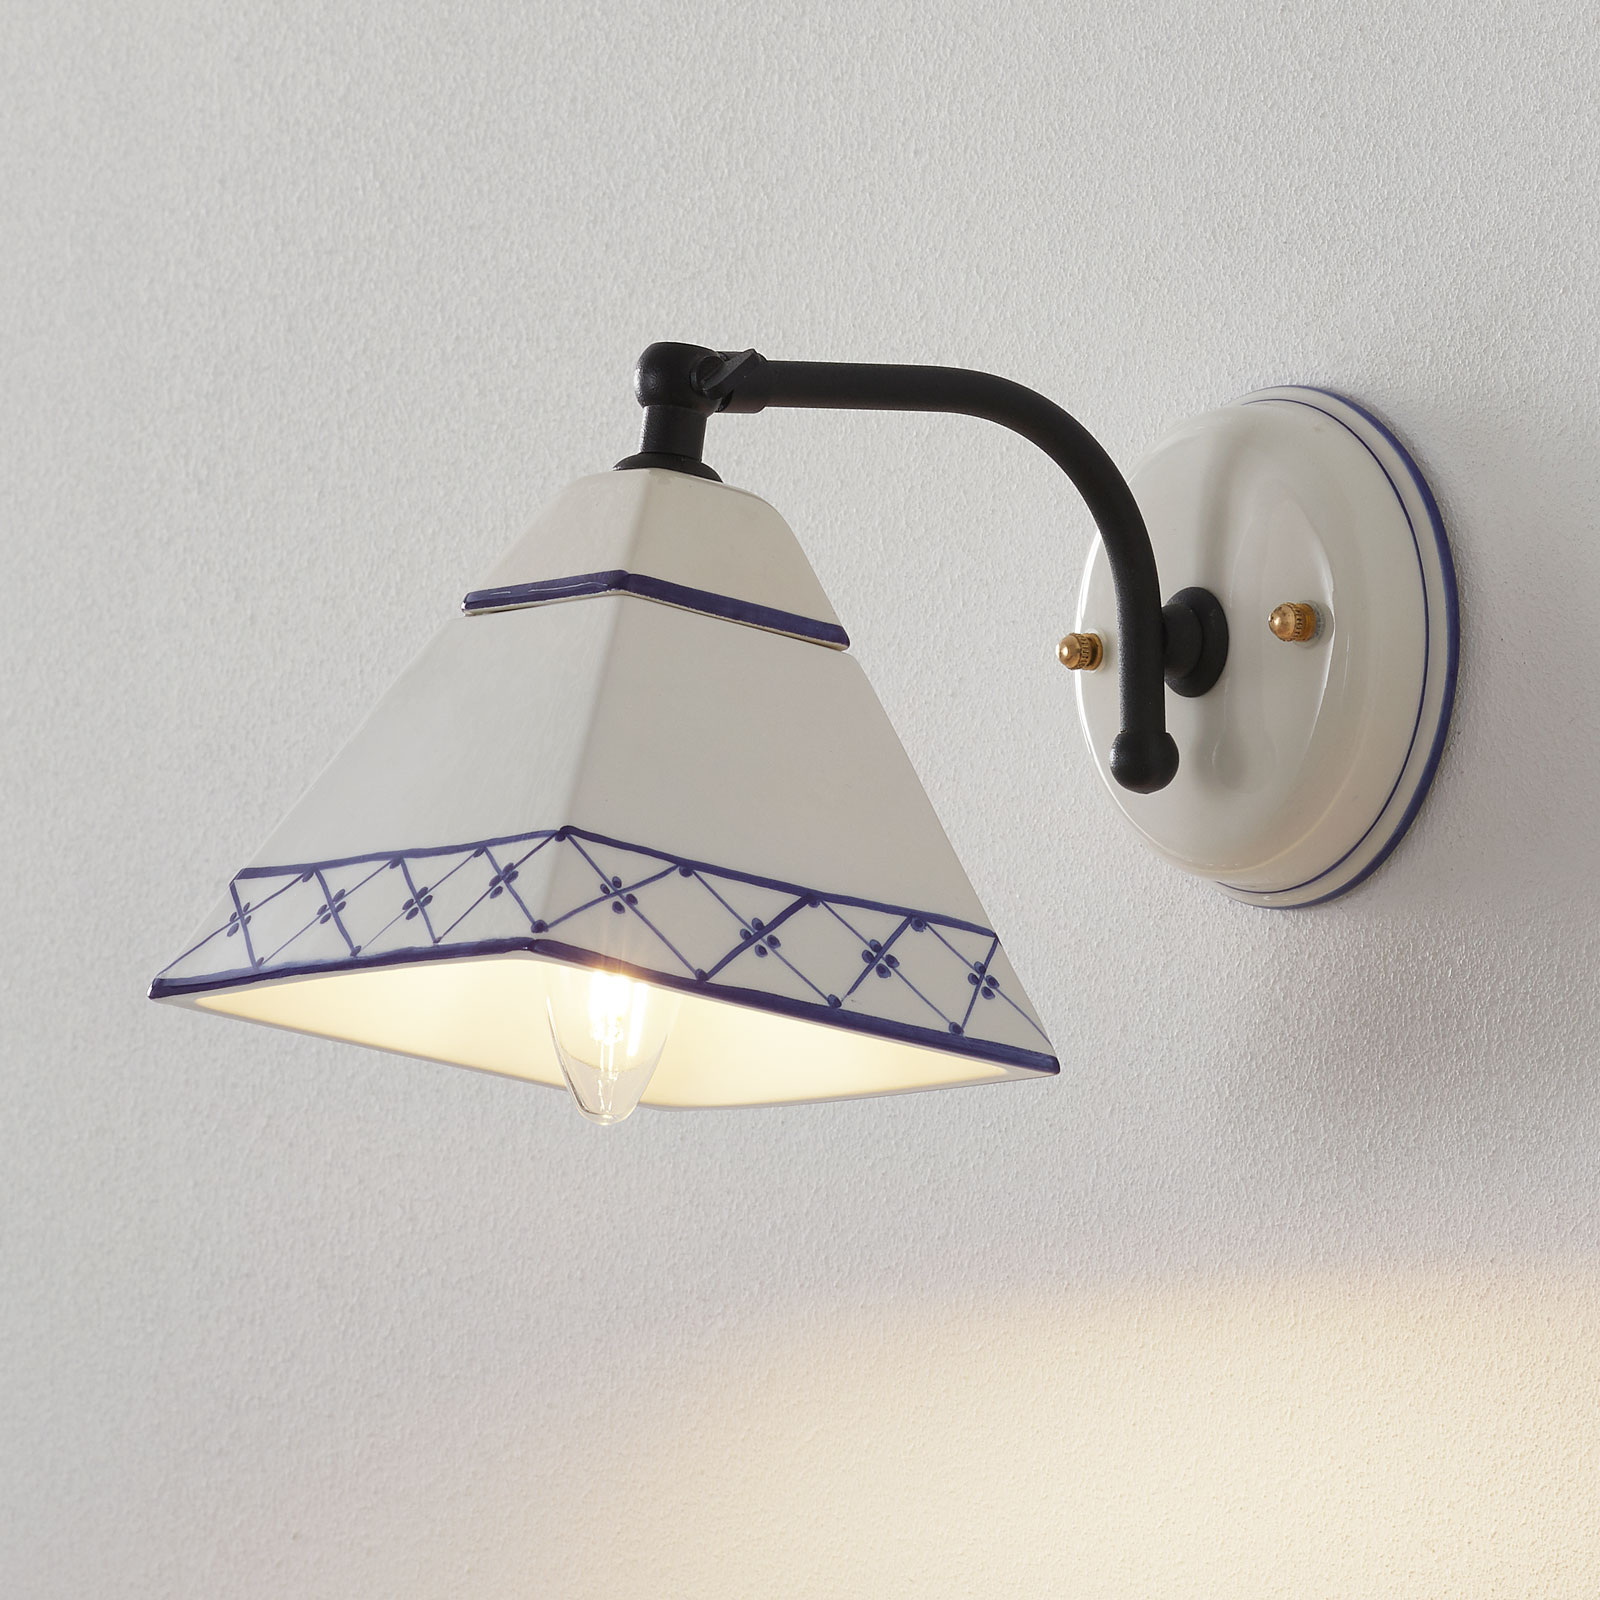 Vägglampa Murano i lantlig stil